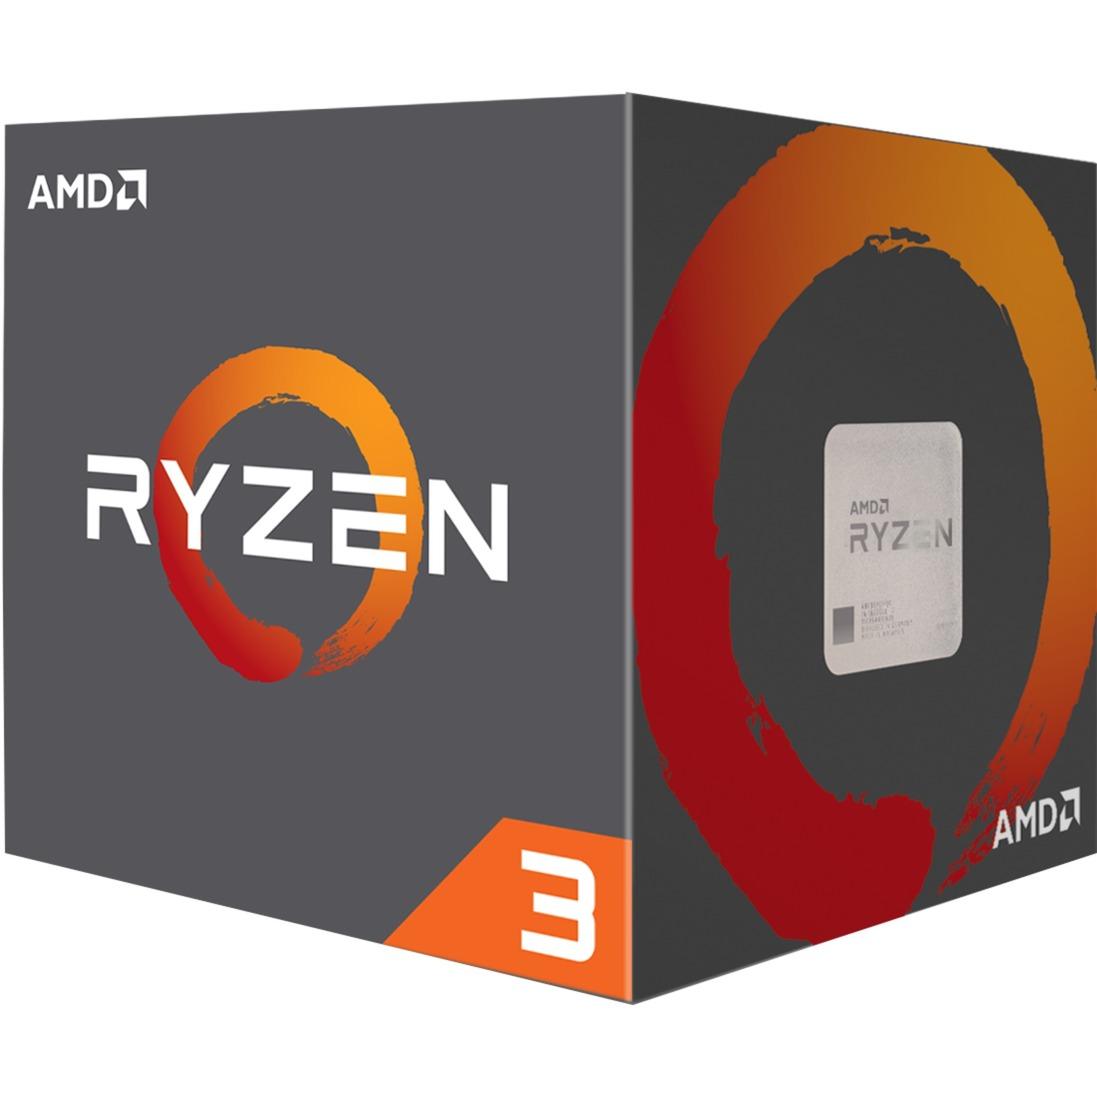 Ryzen 3 1200, 3,1 GHz (3,4 GHz Turbo Boost), Processeur